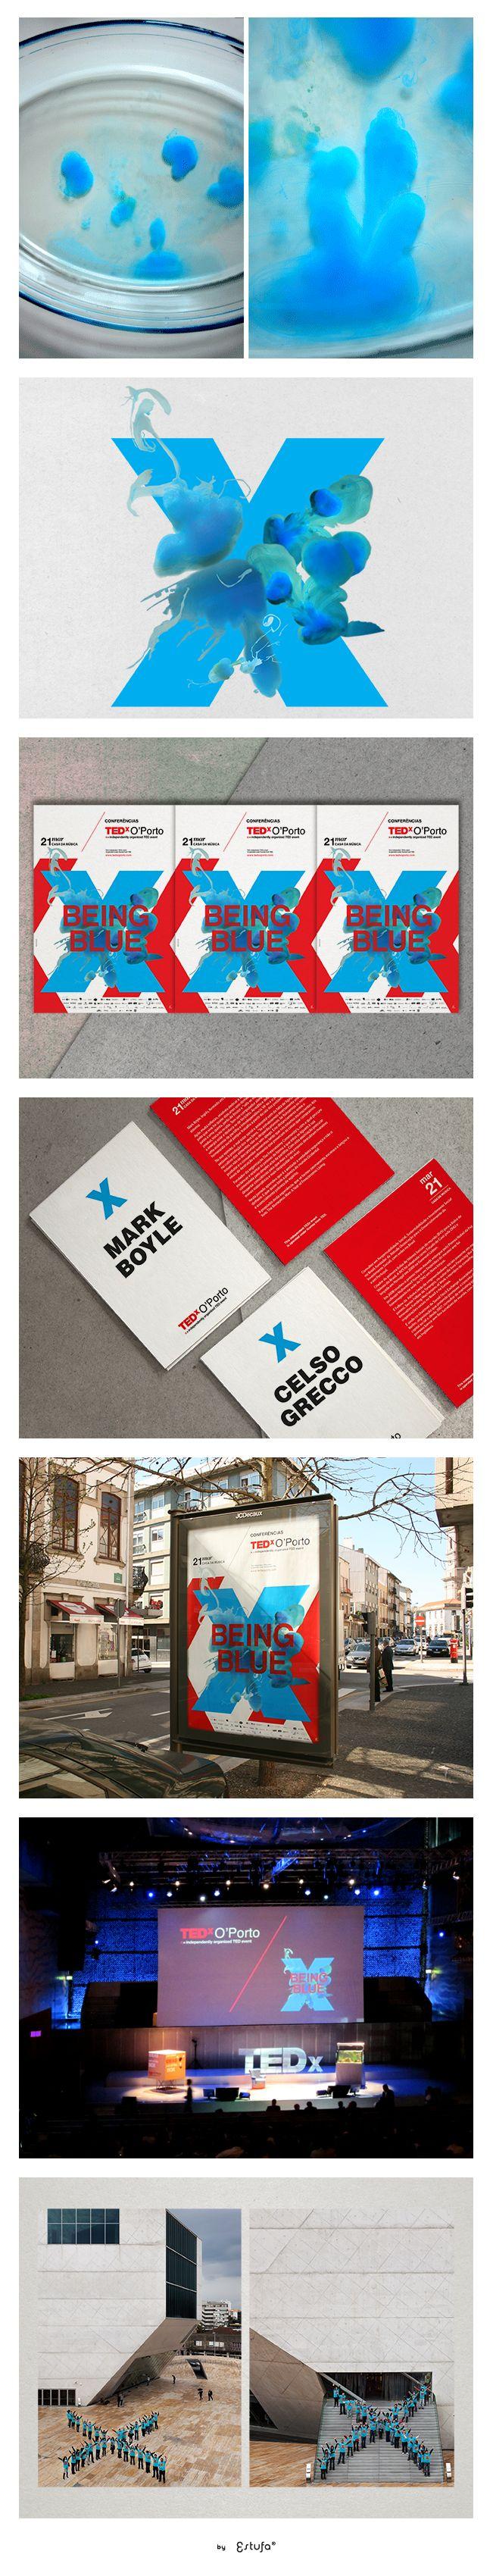 "I D E N T I T Y — Graphic identity for TEDx O'Porto 2011 at Casa da Música with the theme ""being blue""."